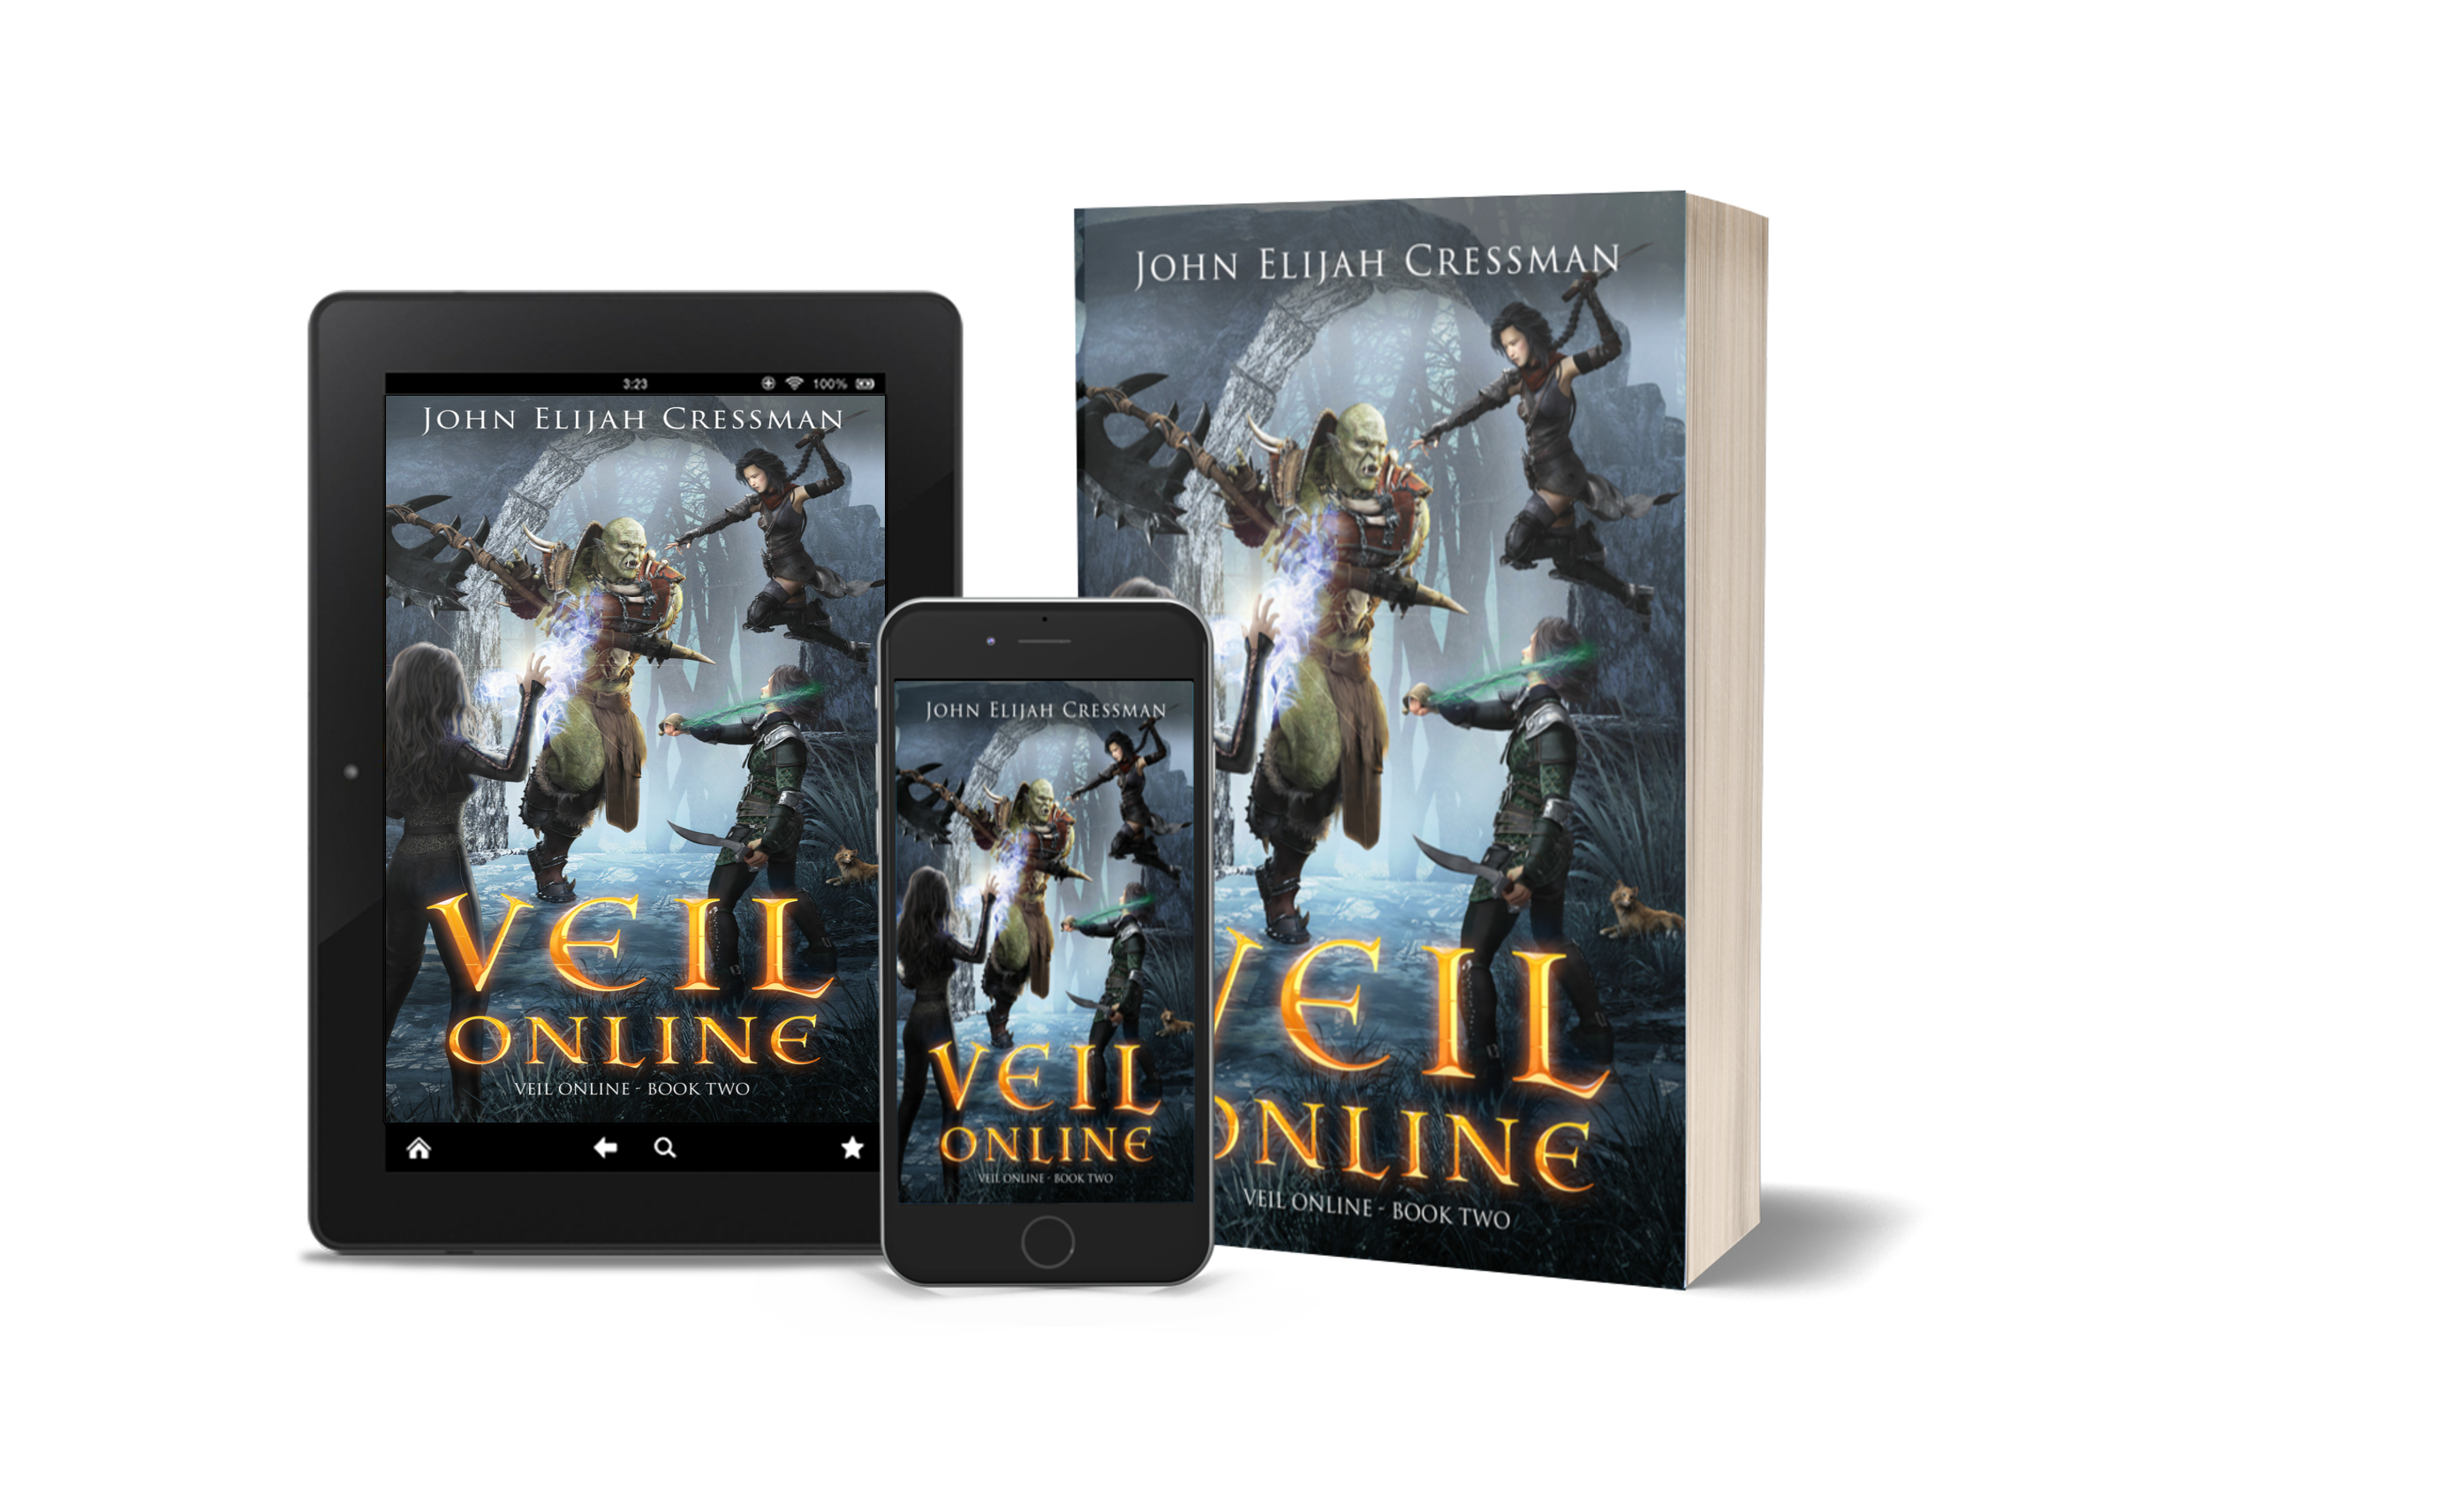 VEIL Online – Book 2 Summary